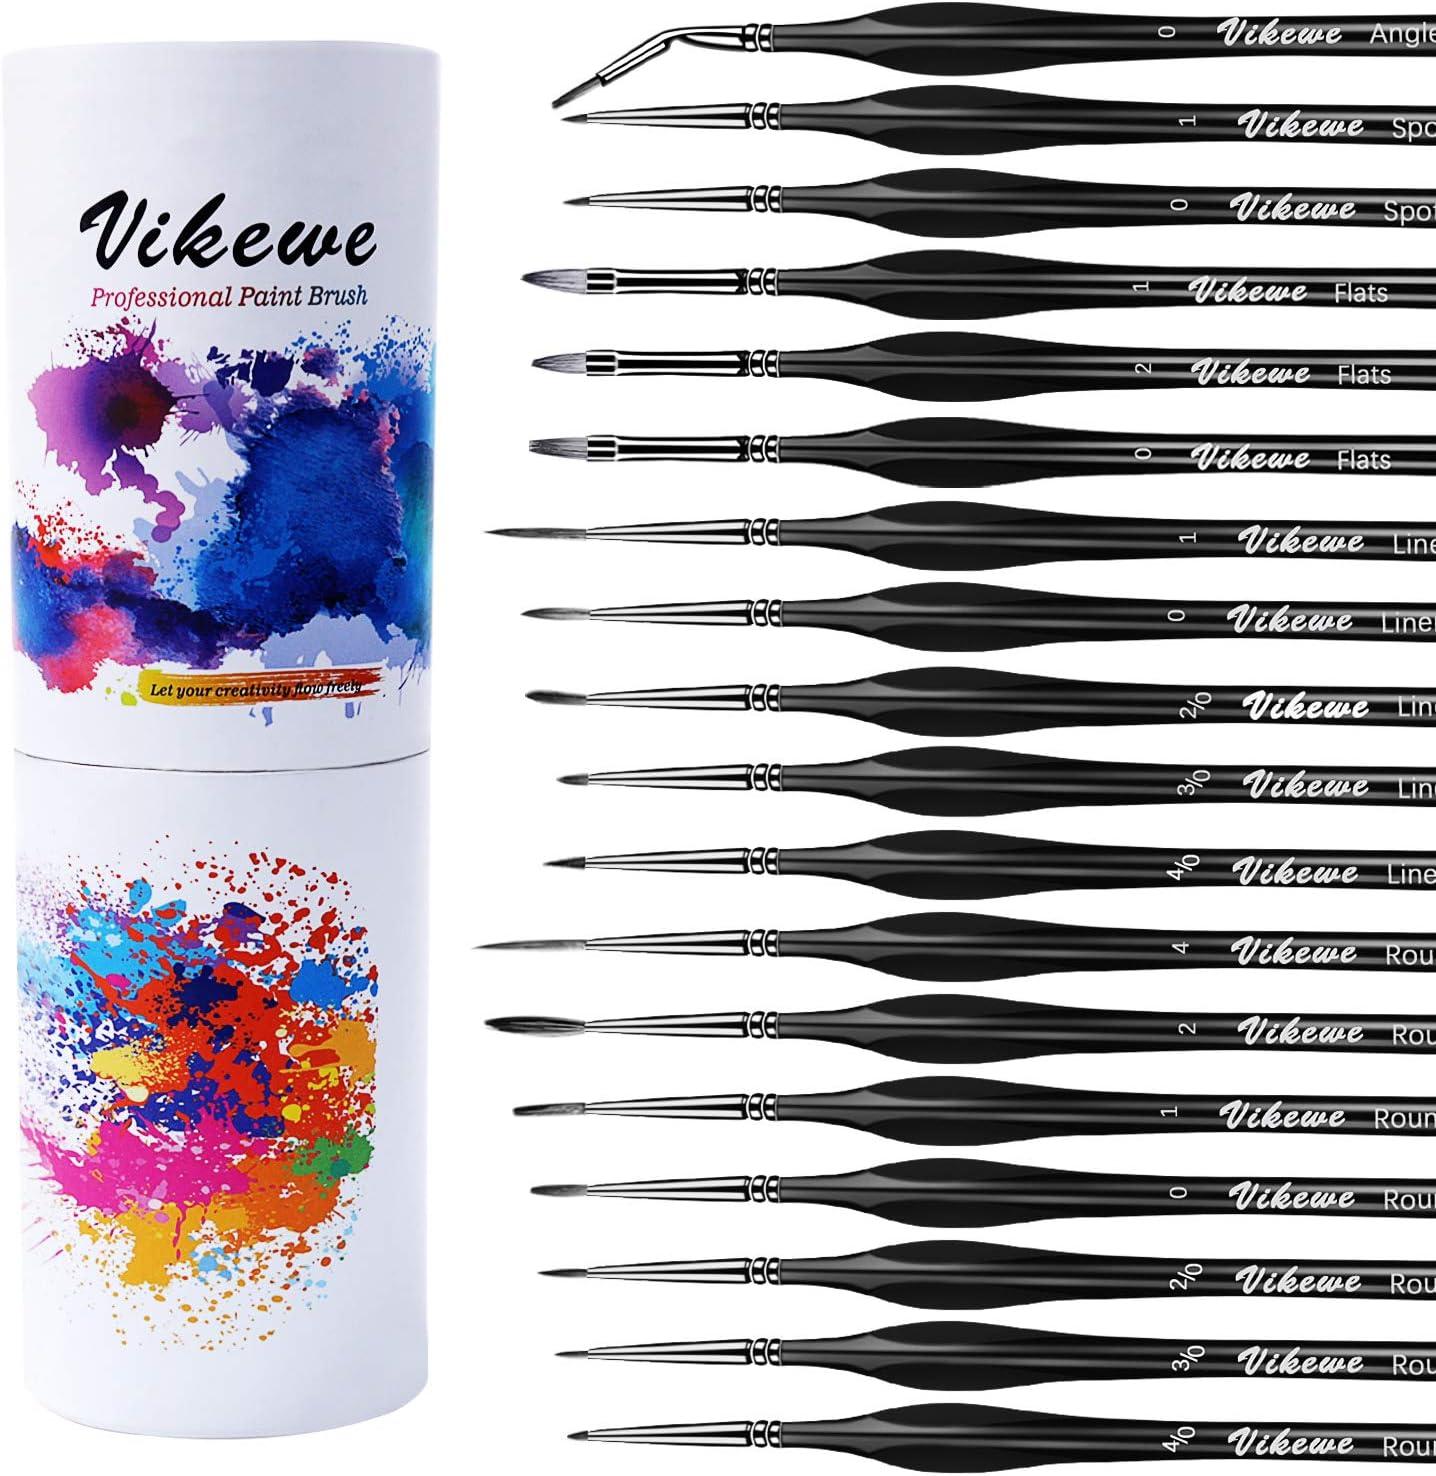 VIKEWE Miniature Paint New products, world's highest quality popular! Brushes Set Detail 18 - PCS Mesa Mall